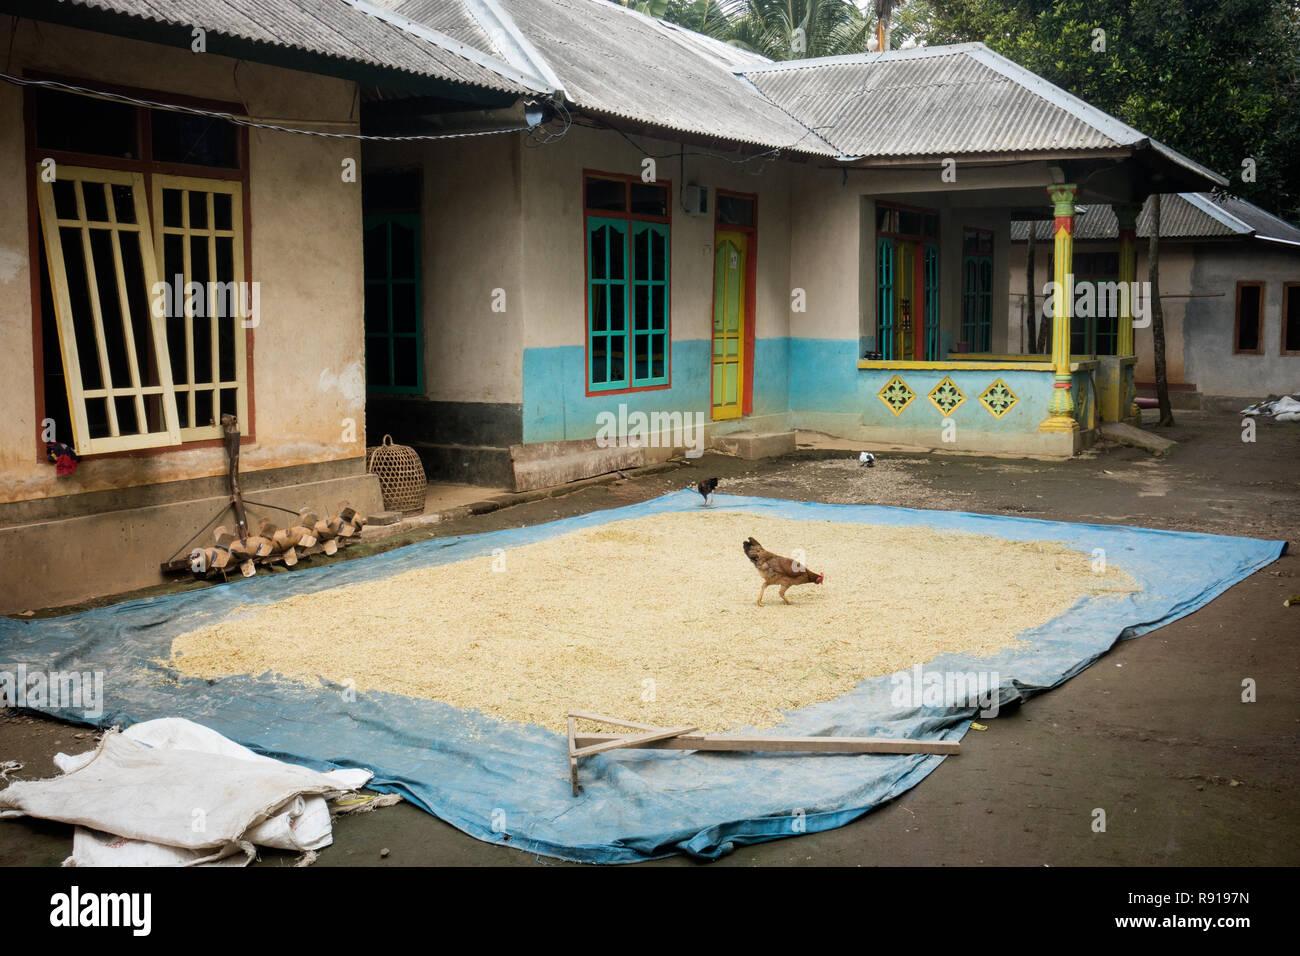 Het drogen van rijst in Tetebatu, Sikur, Kabupaten Lombok Timur, Nusa Tenggara Bar. 83662, Indonesië. Rijst en kruiden drogen. Essiccazione di harversted ri Immagini Stock